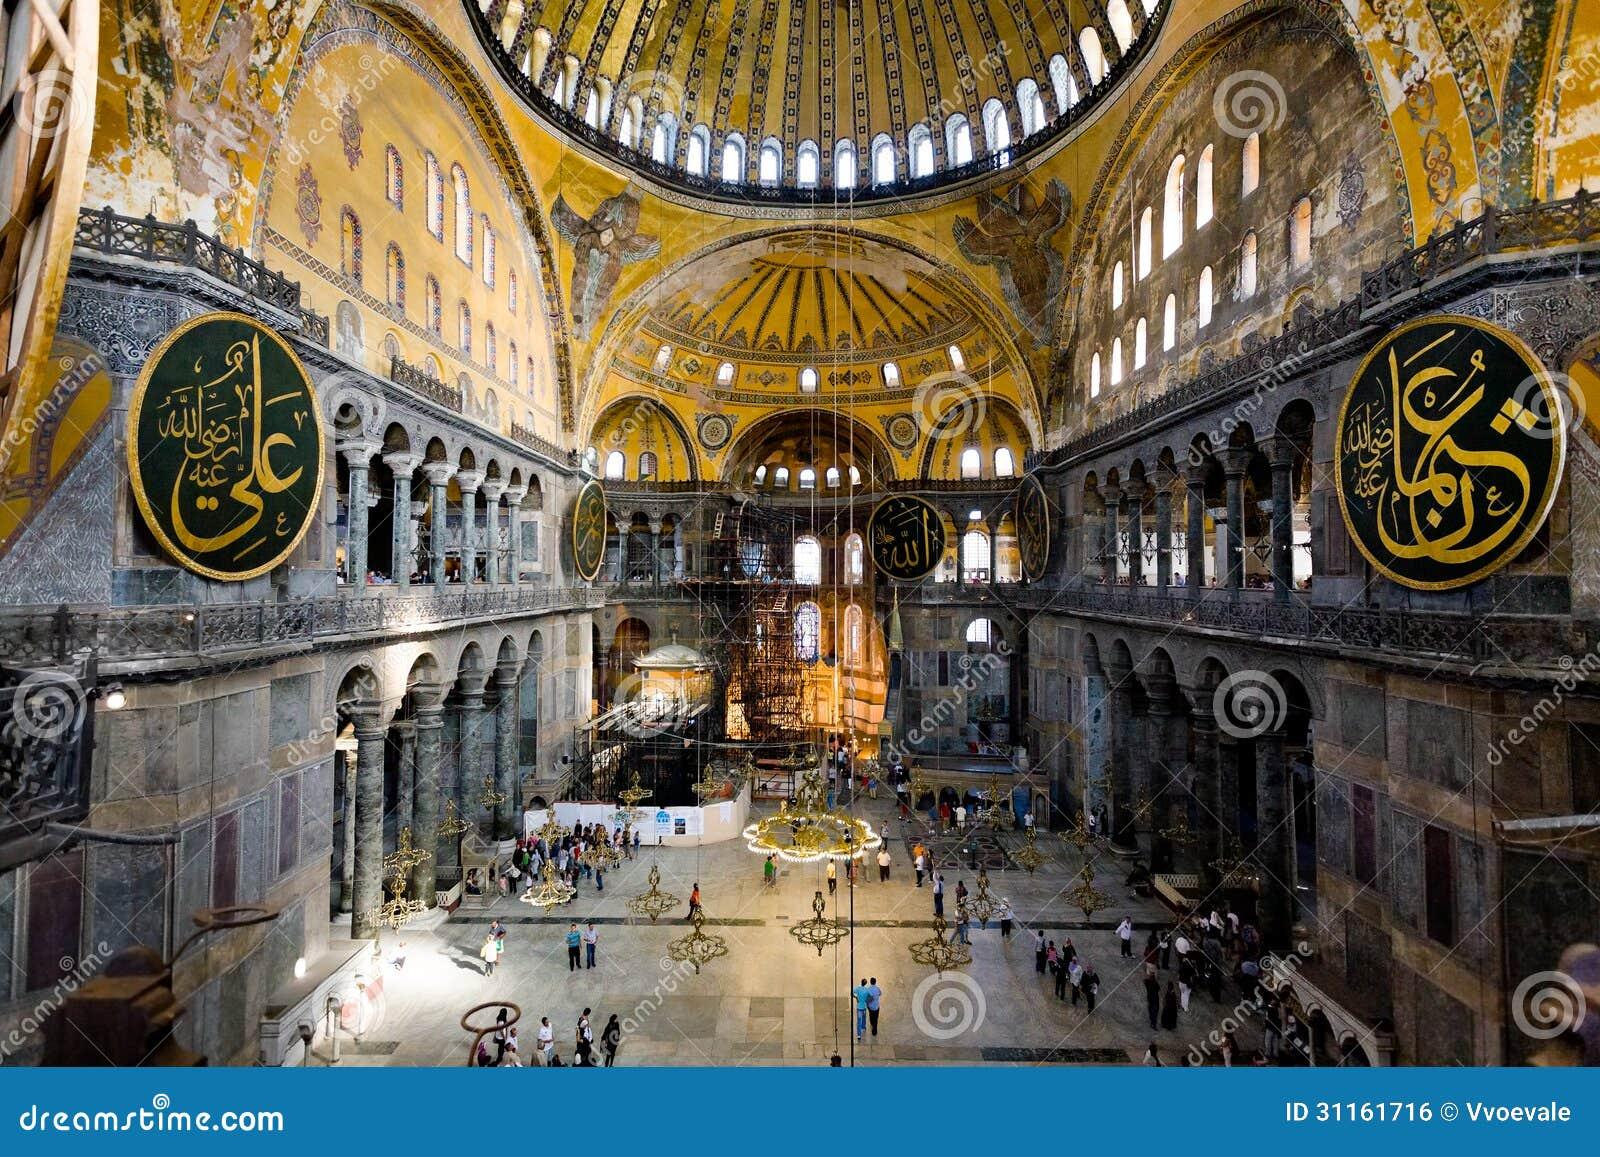 Interior of Aya Sophia - ancient Byzantine basilica